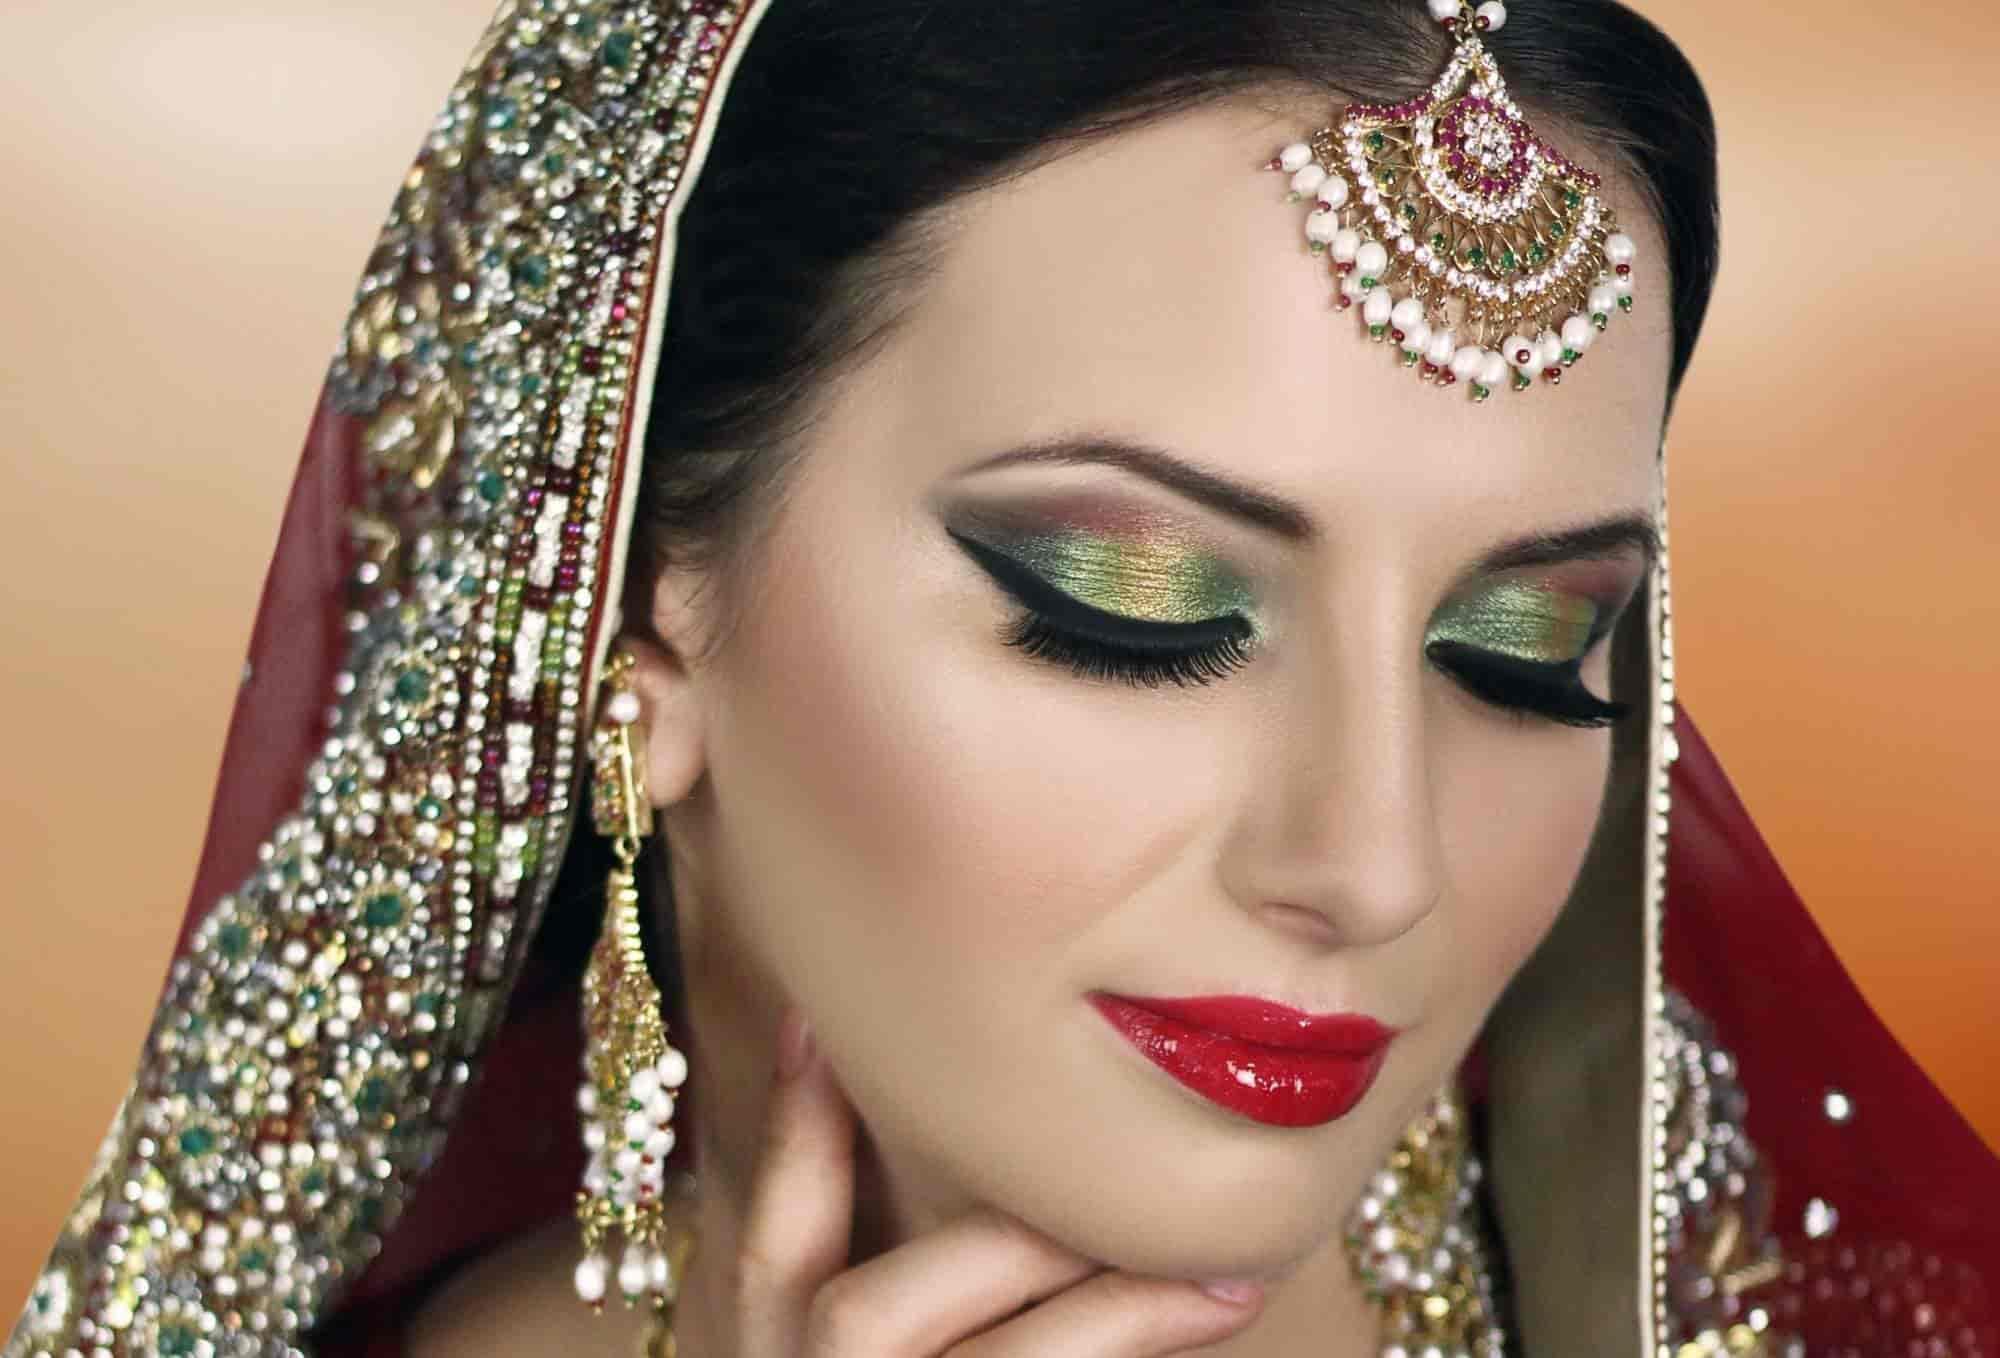 Bulbul Bridal Makeup Artist And Beauty Parlour Kumhari Beauty Parlours In Durg Justdial